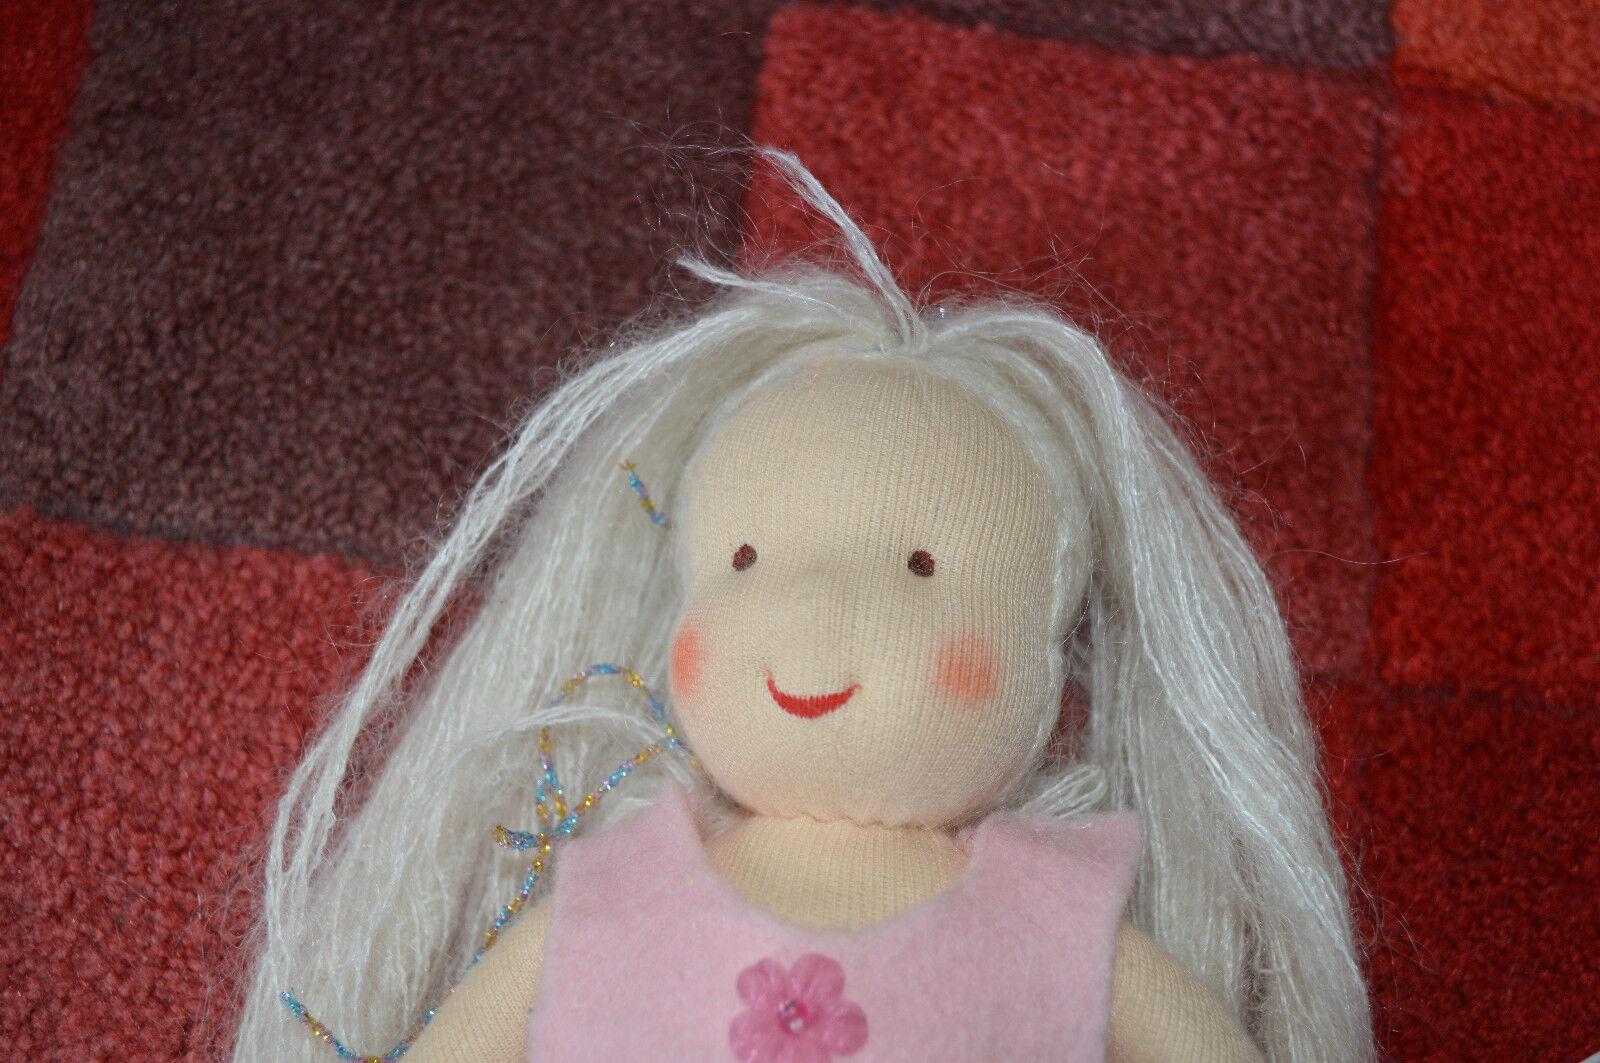 Käthe kruse Mini It`s Me Me It`s  Puppe  Waldorf  Elfchen neu  26 cm 81dff1